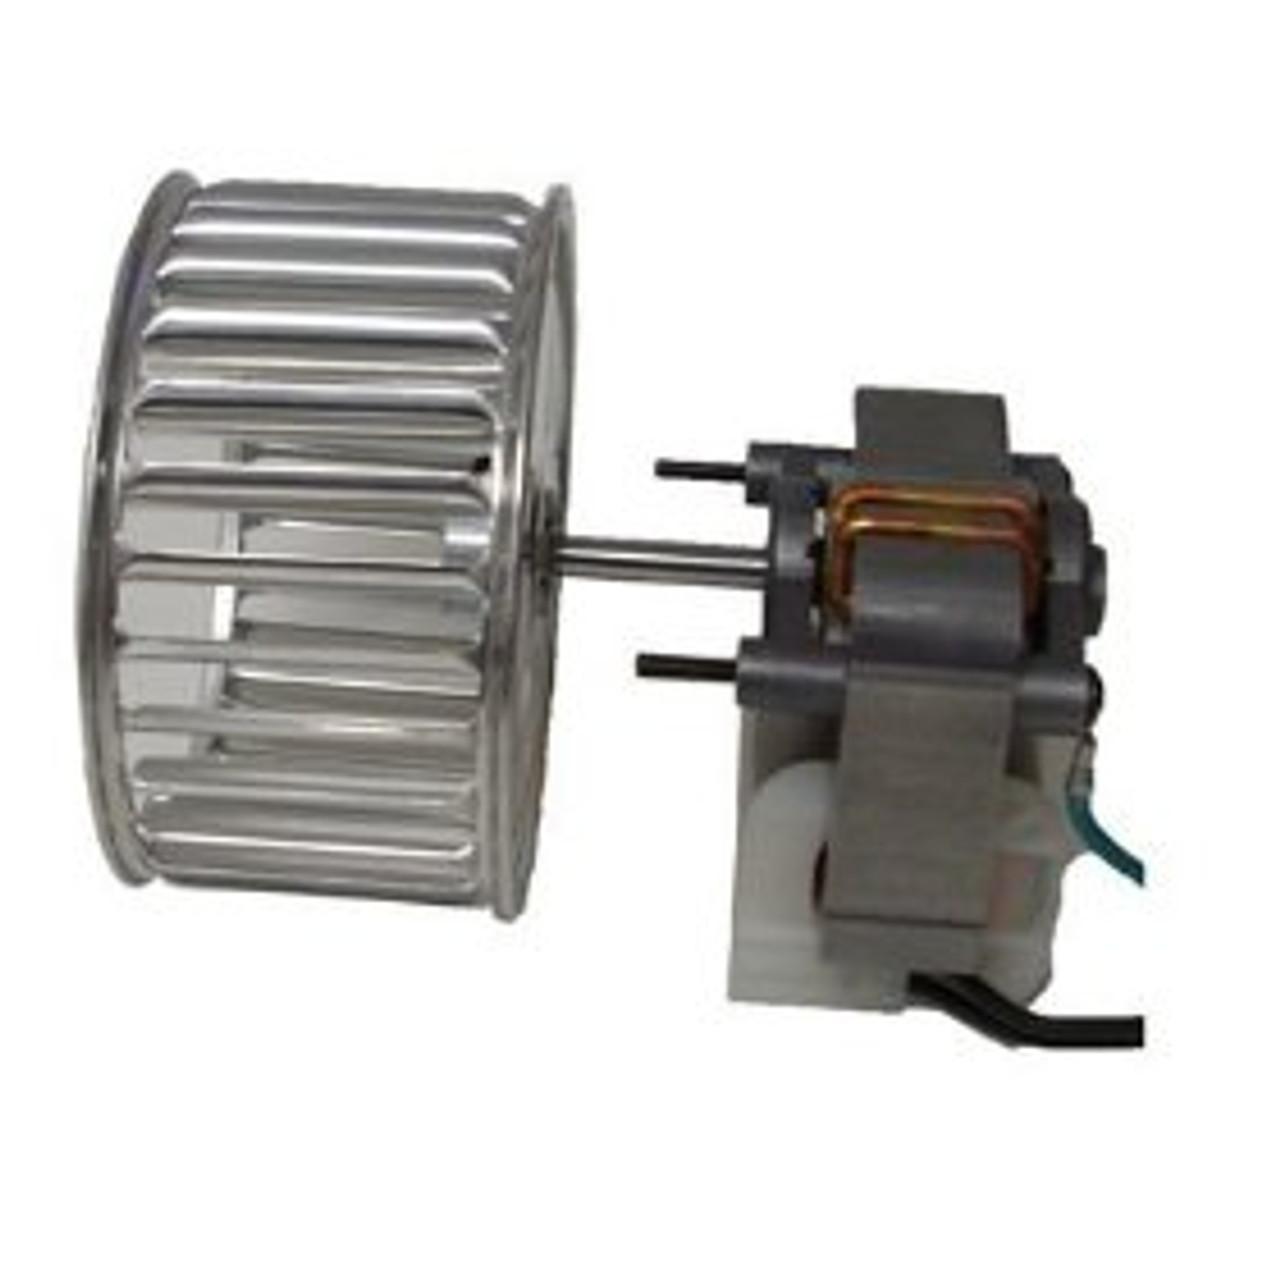 E-69285 (open box) Broan/Nutone Motor and Blower Wheel